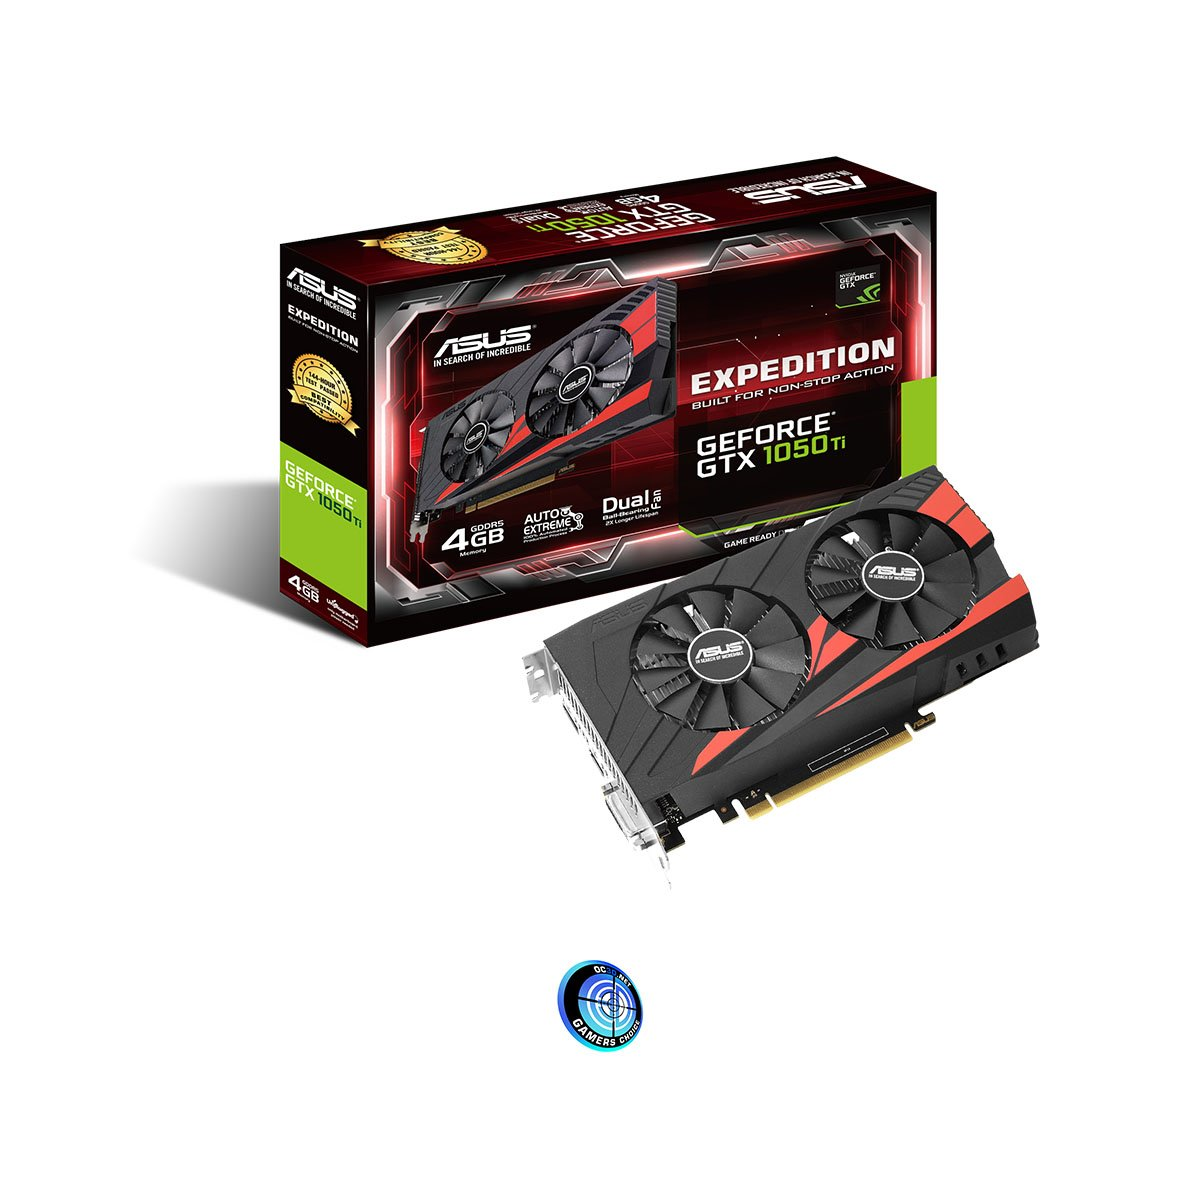 ASUS GTX1050Ti-4G - Tarjeta gráfica (NVIDIA GPU Boost 2.0, Memoria de 4 GB GDDR5, PCIE Express 3.0, hasta 7680 × 4320) Color Negro: Amazon.es: Informática